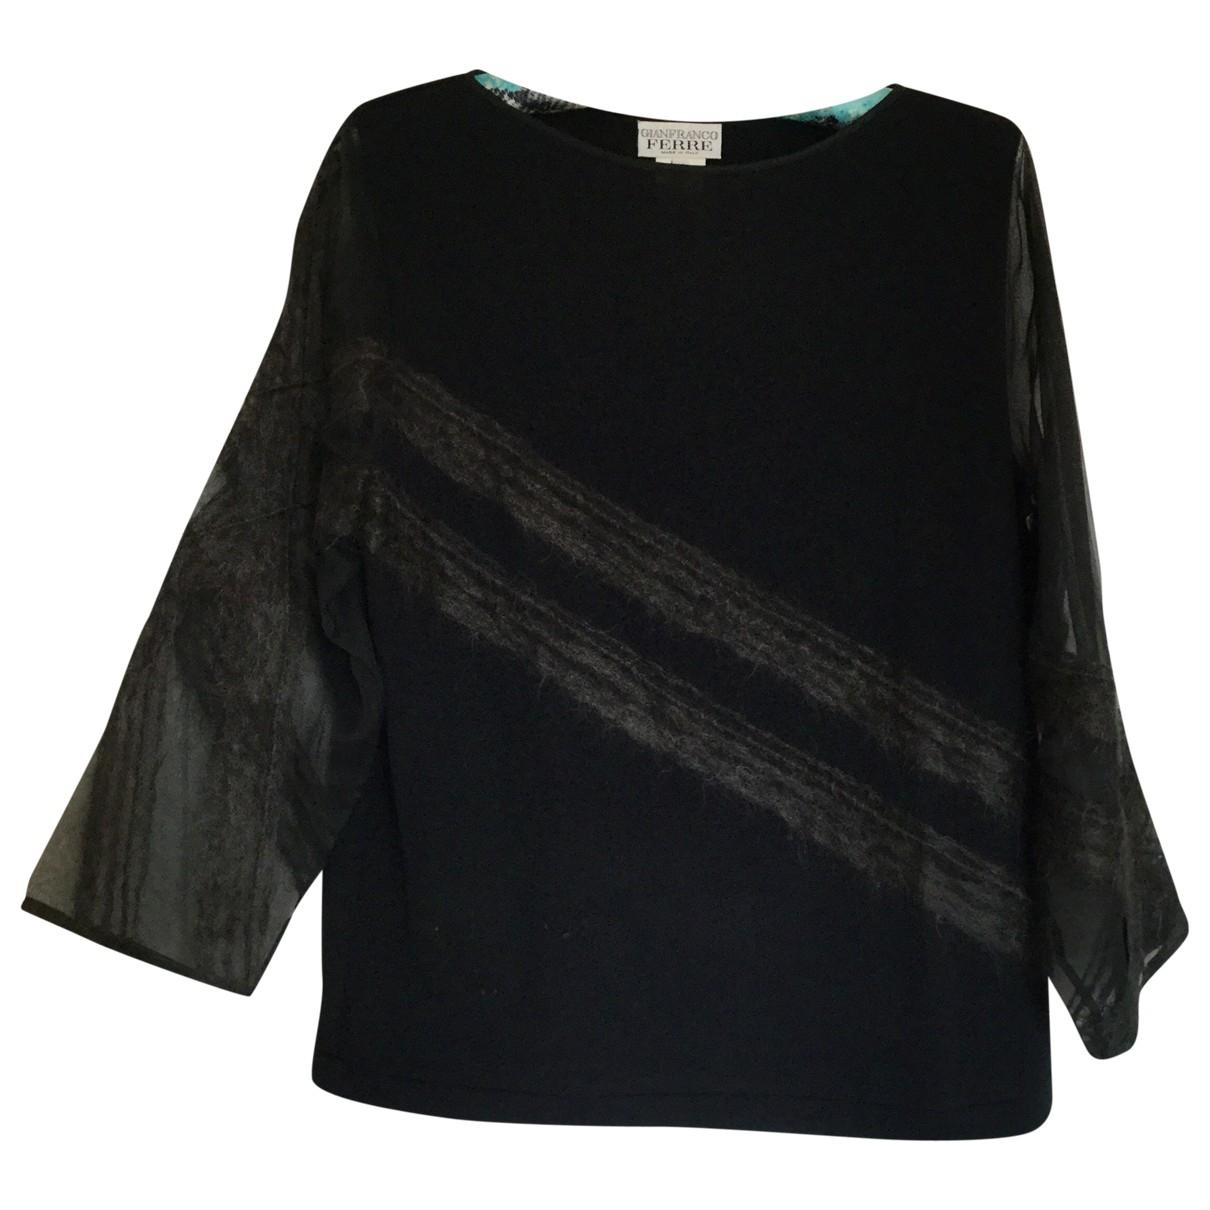 Gianfranco Ferre \N Pullover in  Schwarz Wolle